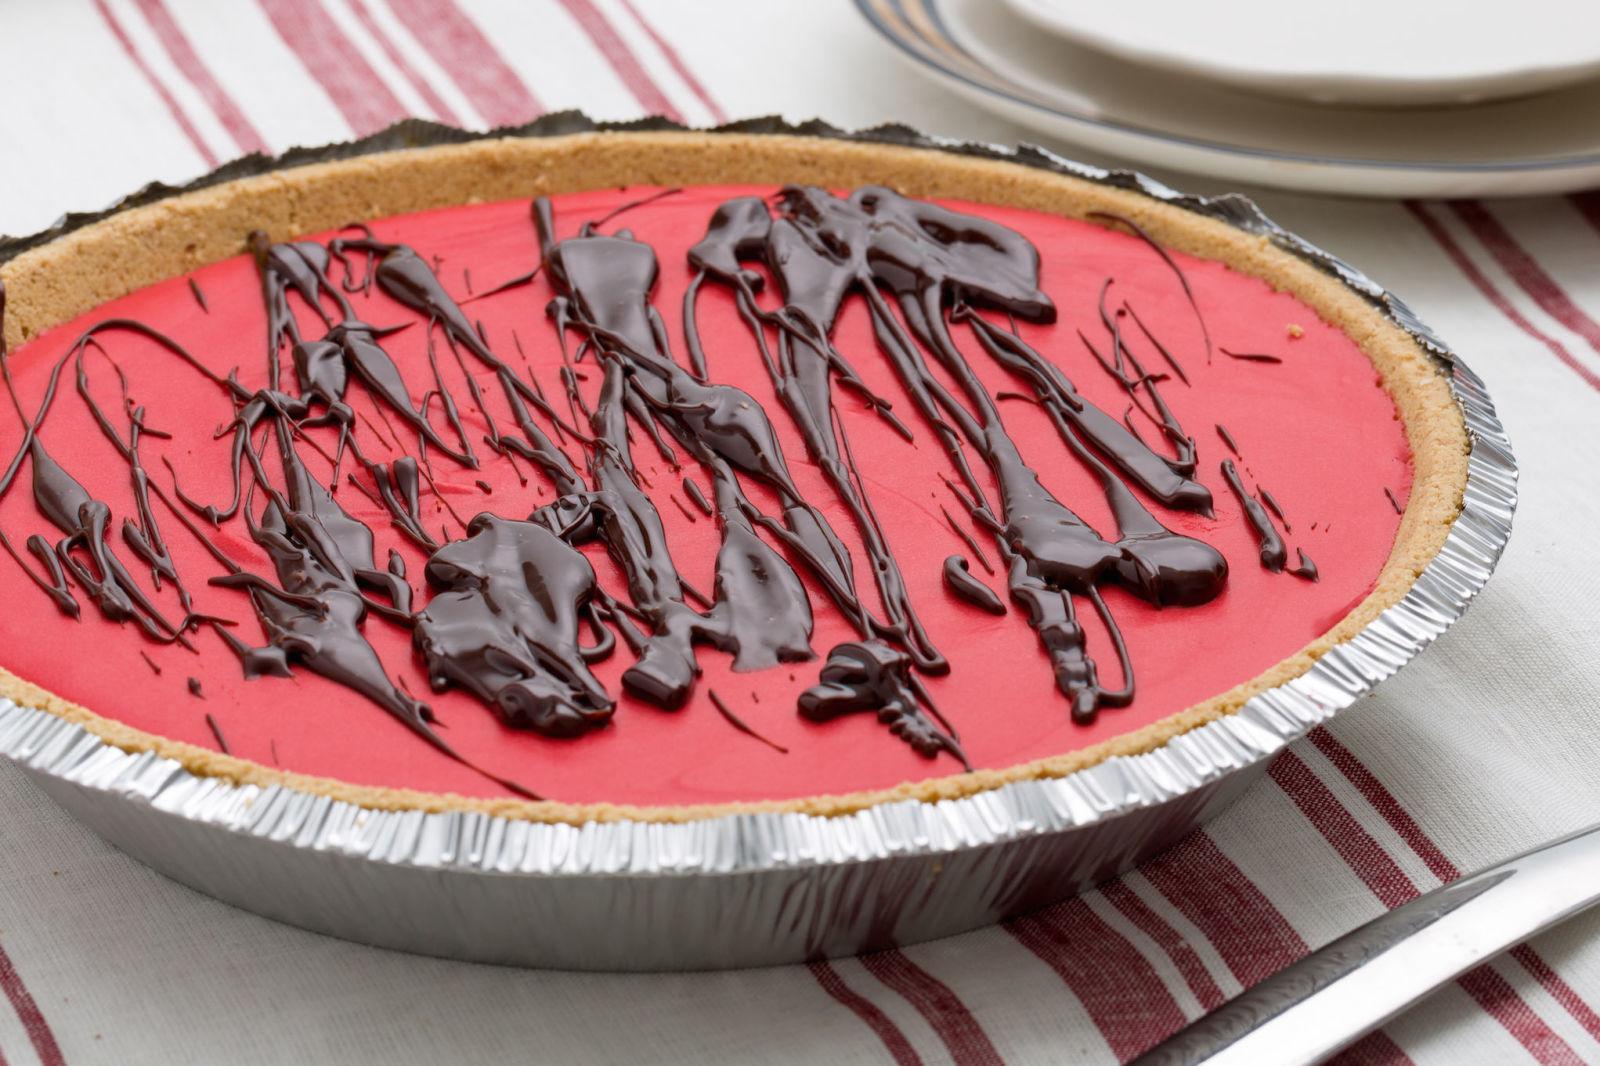 15 Yummy & Romantic Dessert Recipes for Valentine's Day